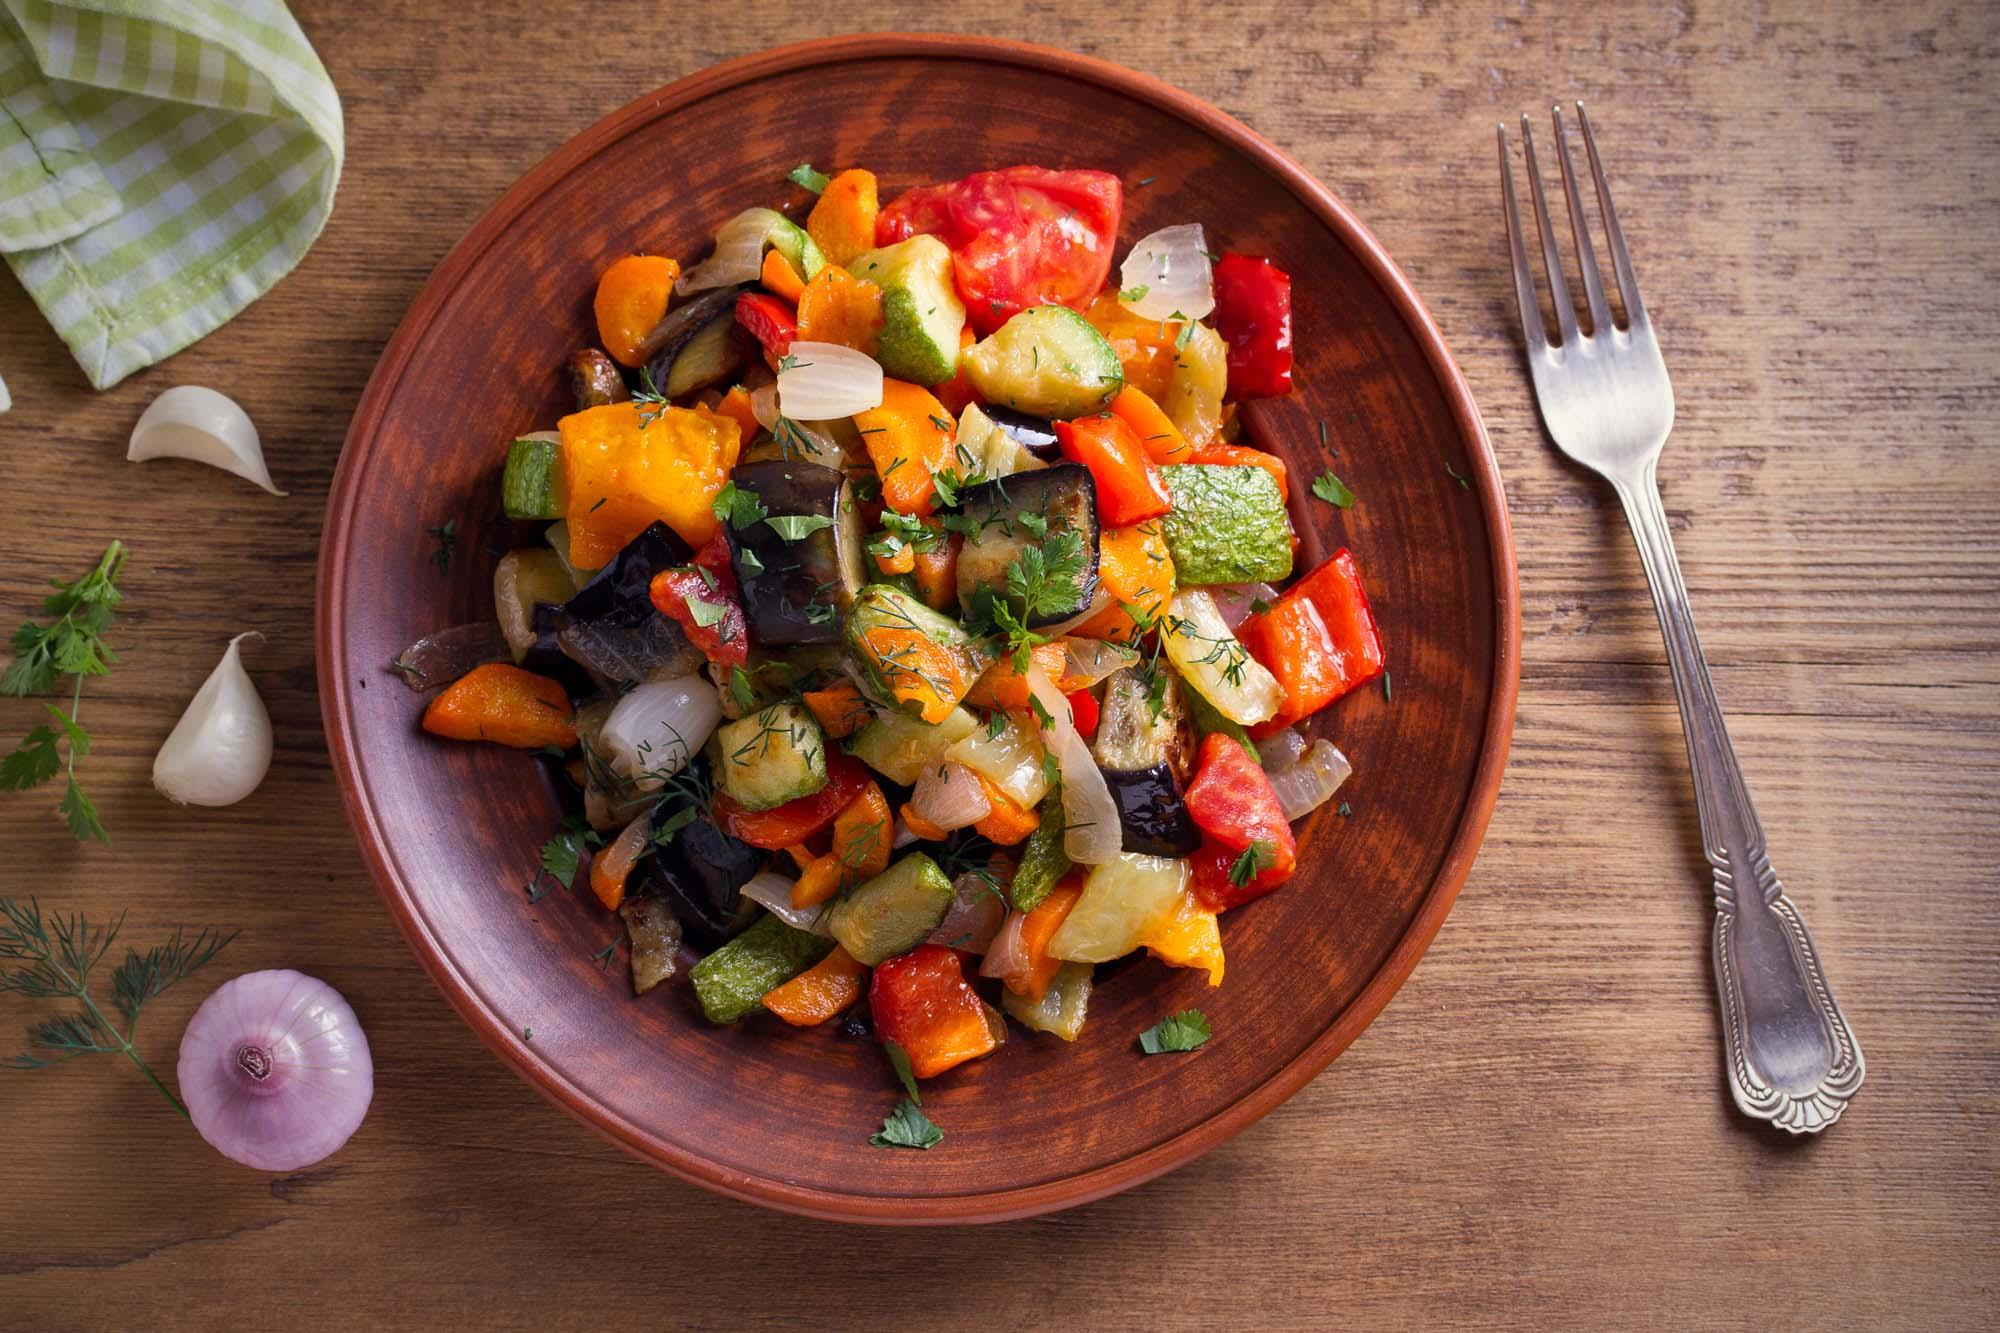 Ristet aubergine-salat med kapers og løg